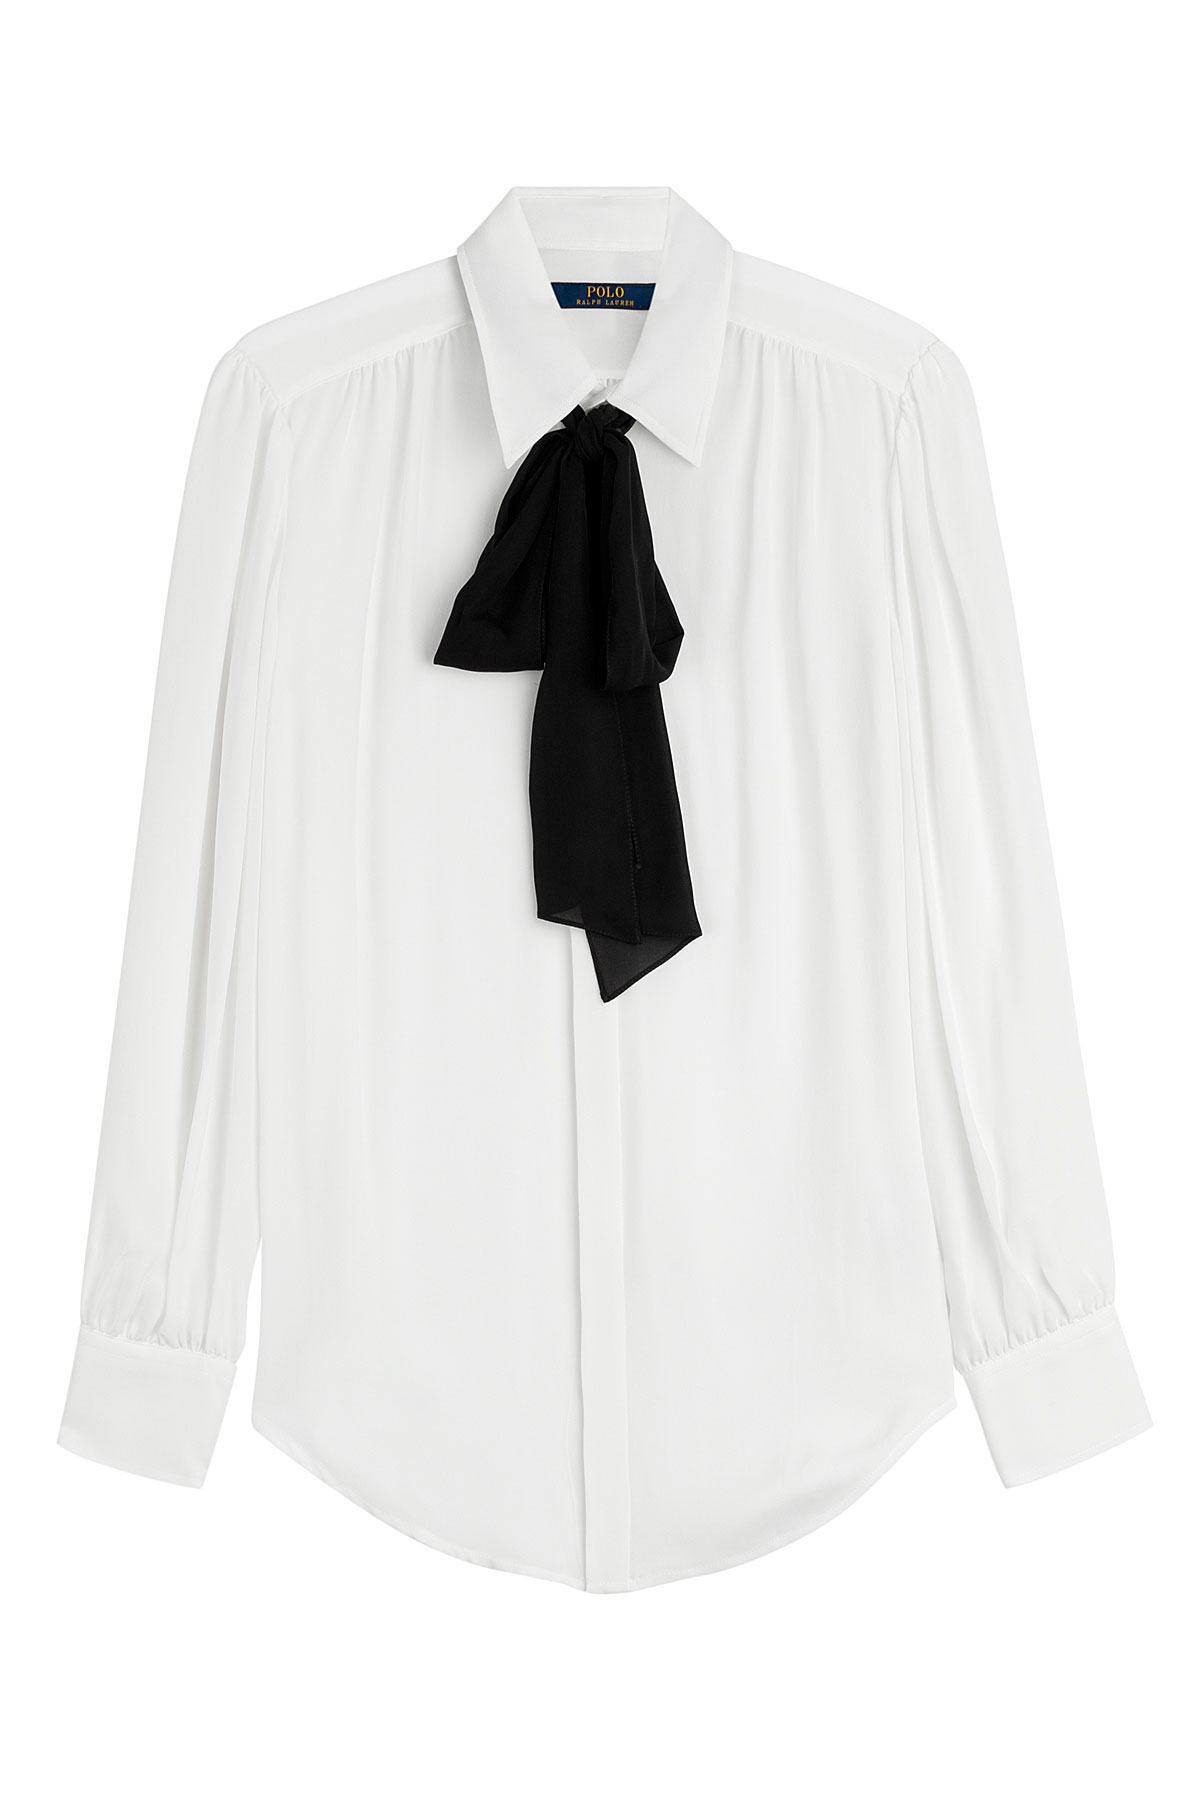 60b79983272b2e Polo Ralph Lauren Silk Blouse With Black Bow White In Lyst